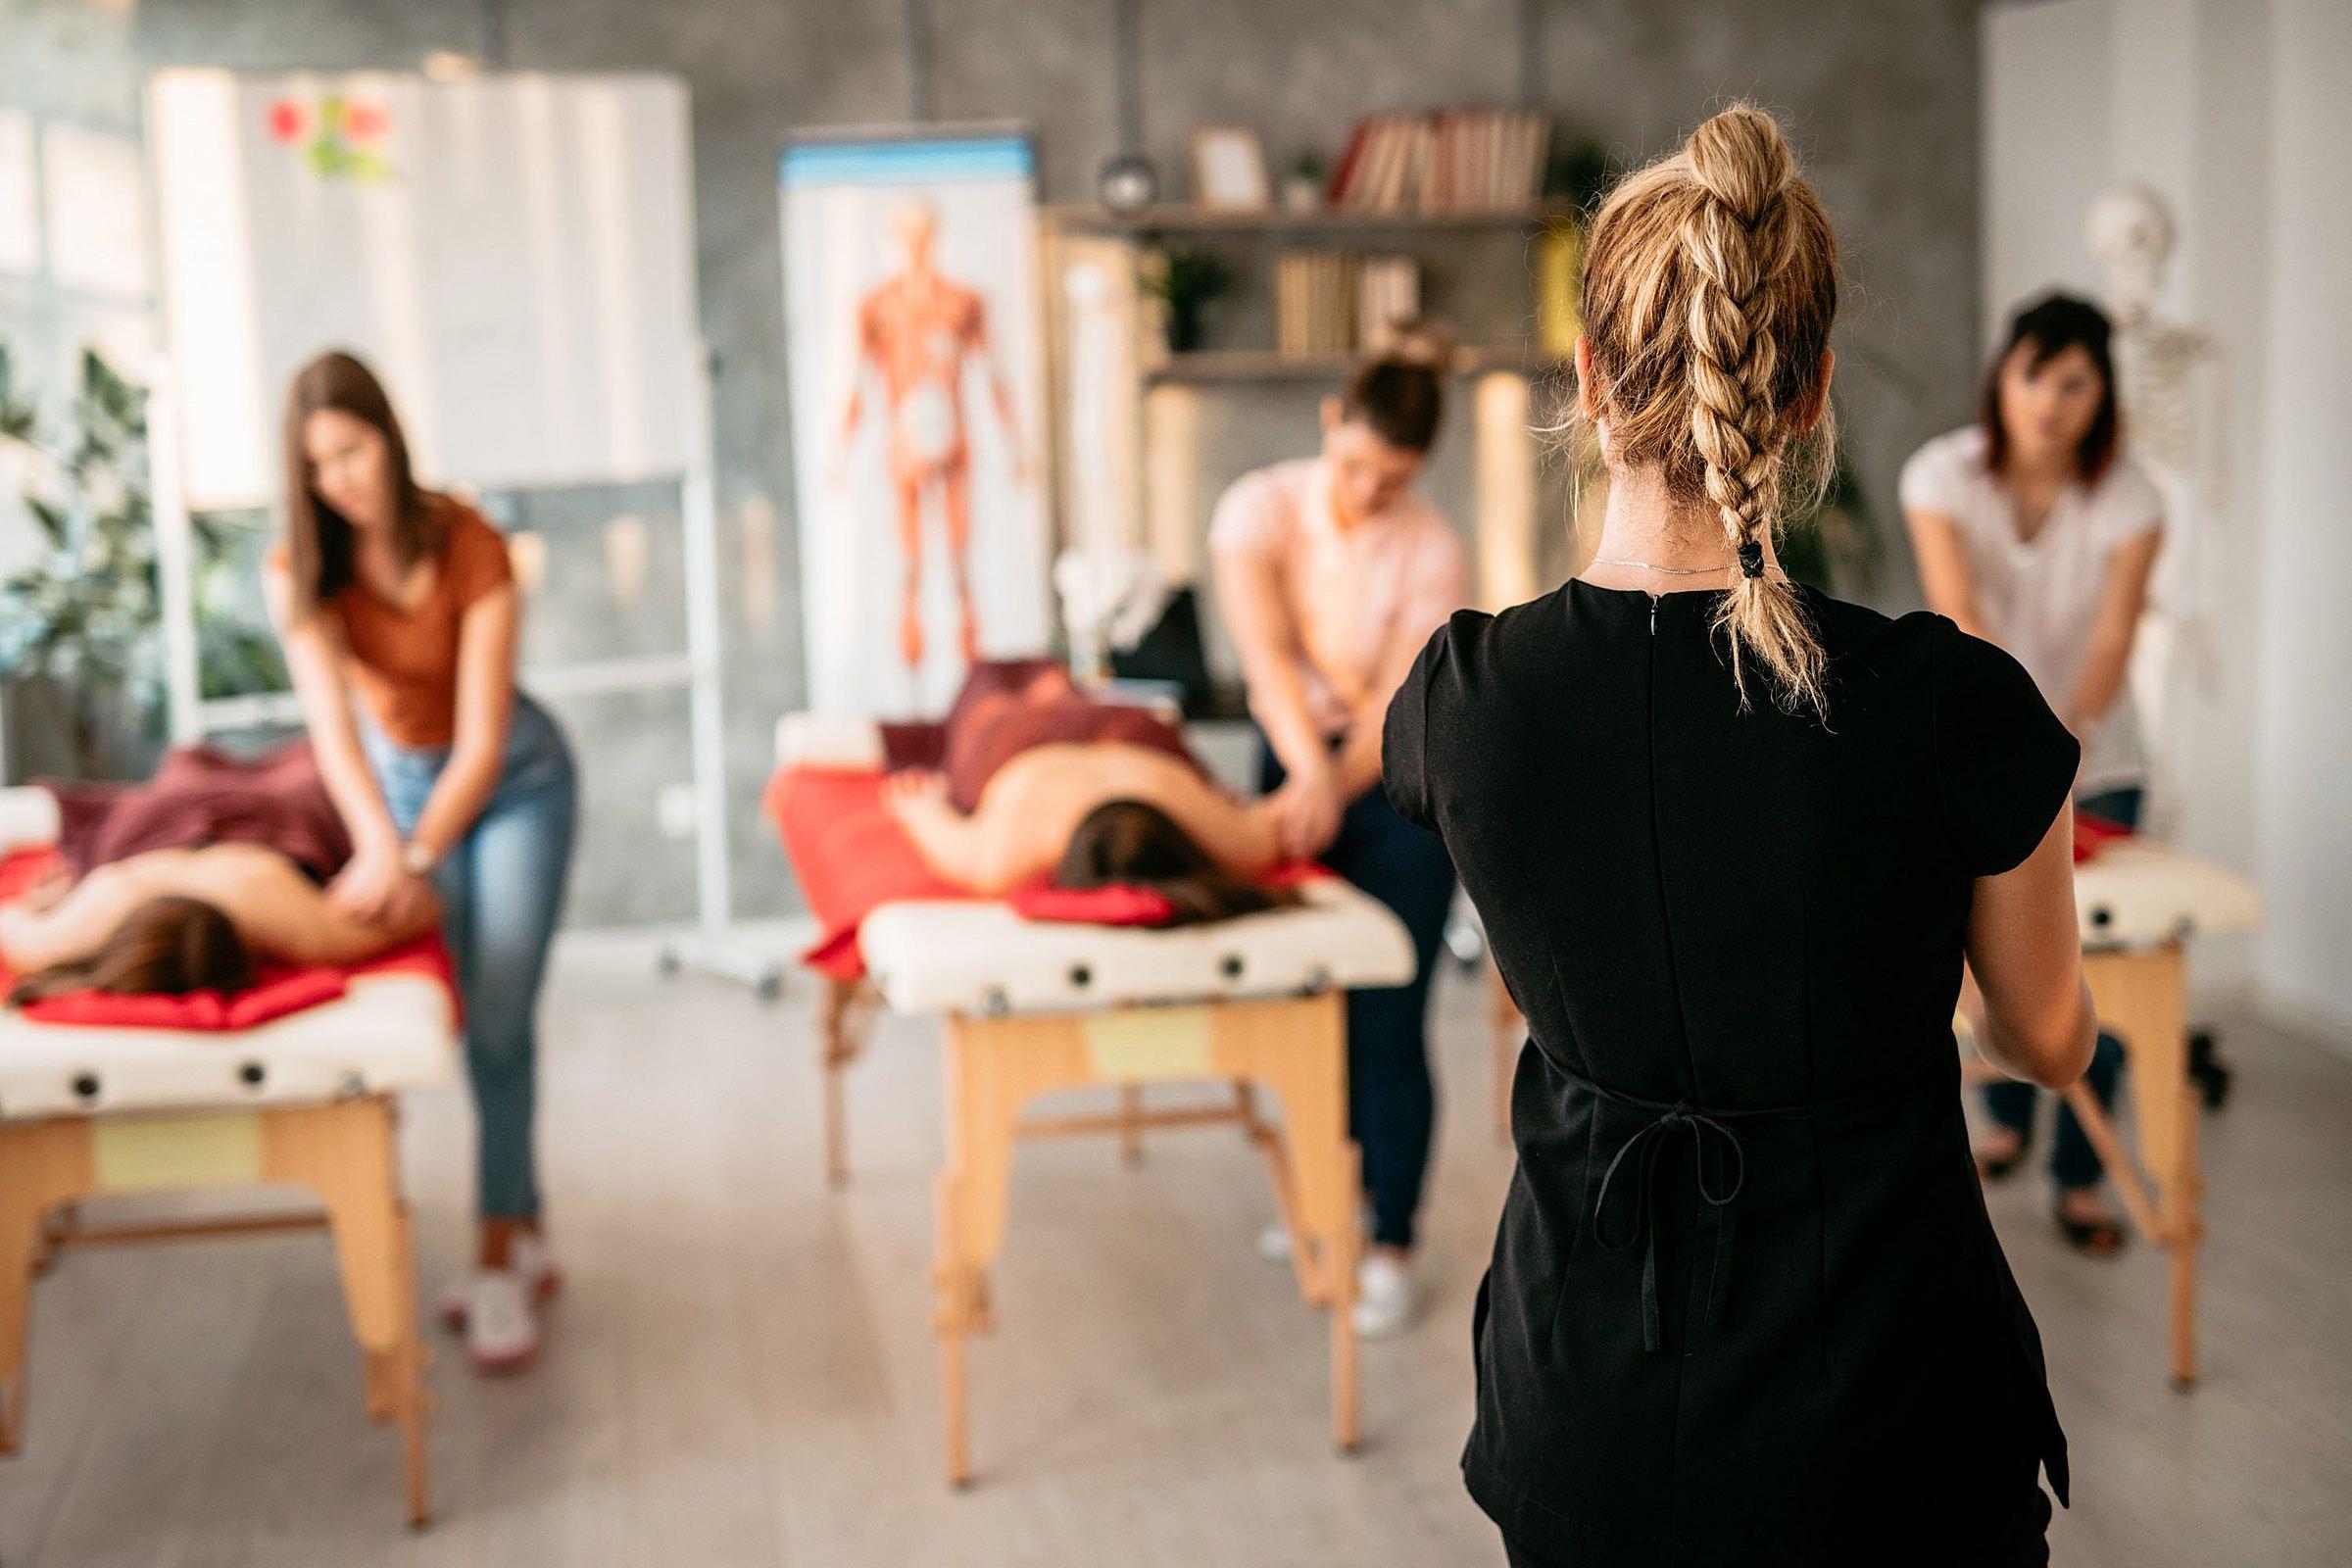 Qual a importância do networking na fisioterapia e como realizá-lo?